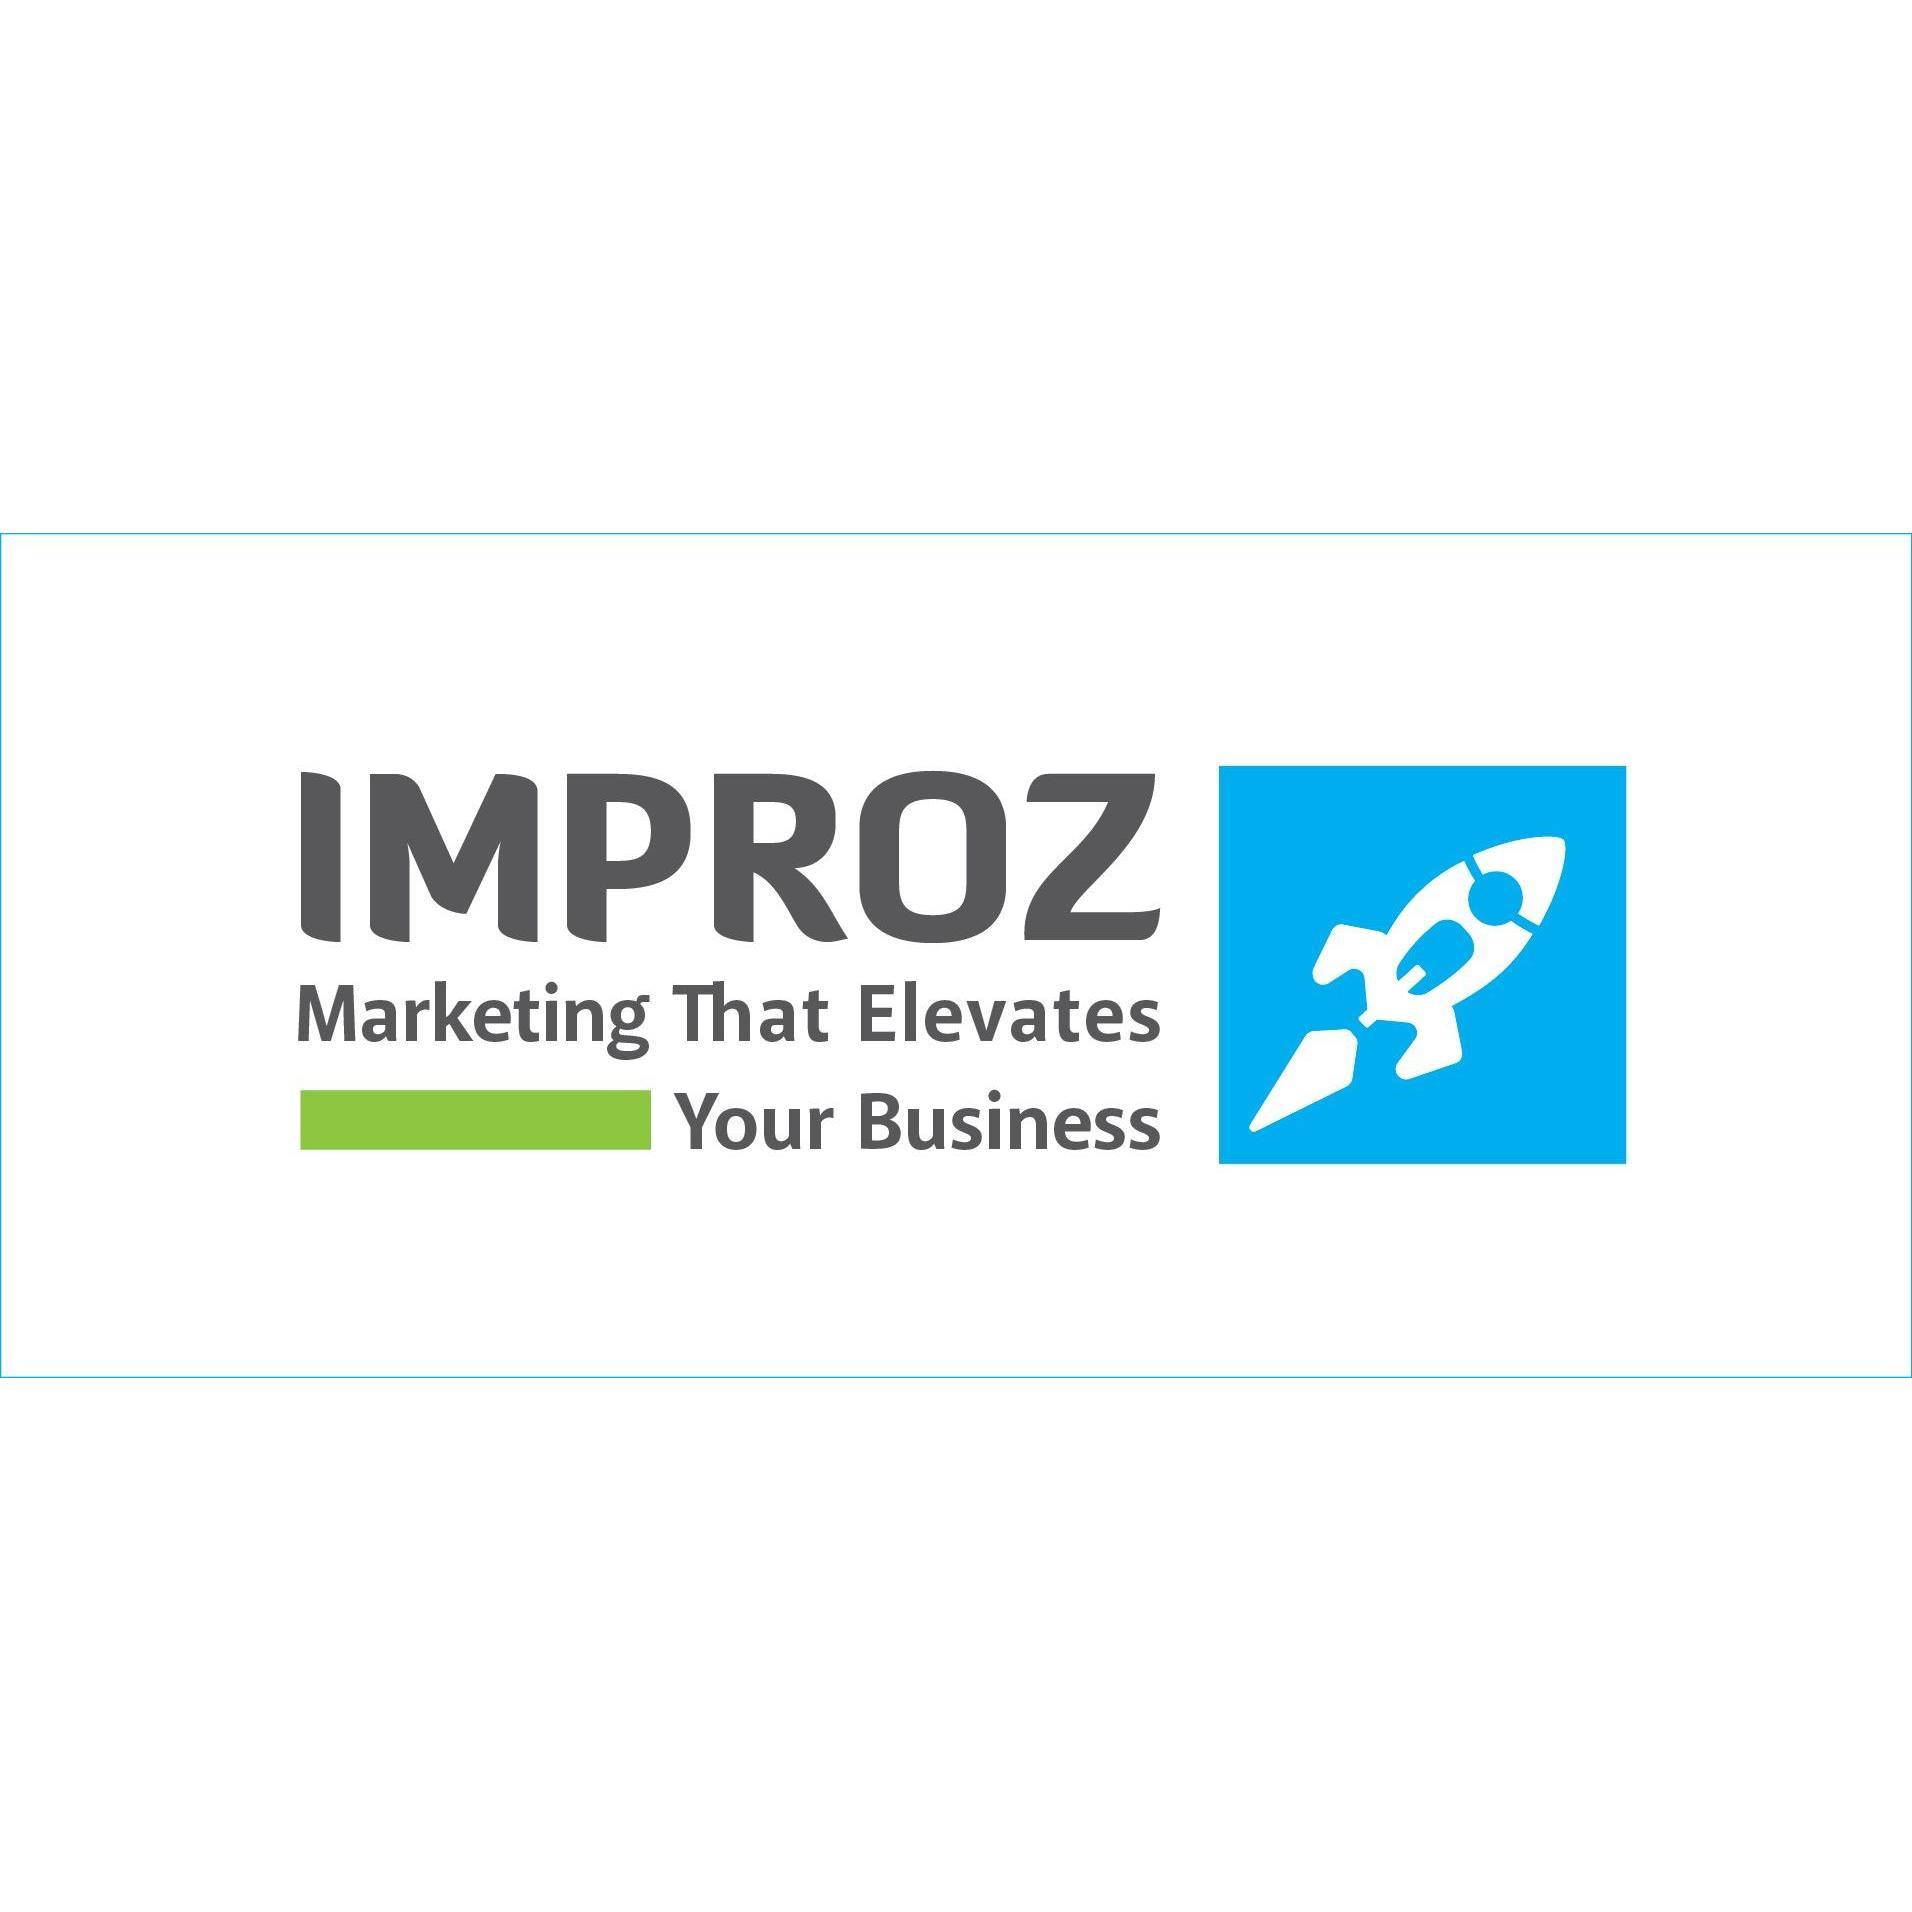 IMPROZ Internet Marketing